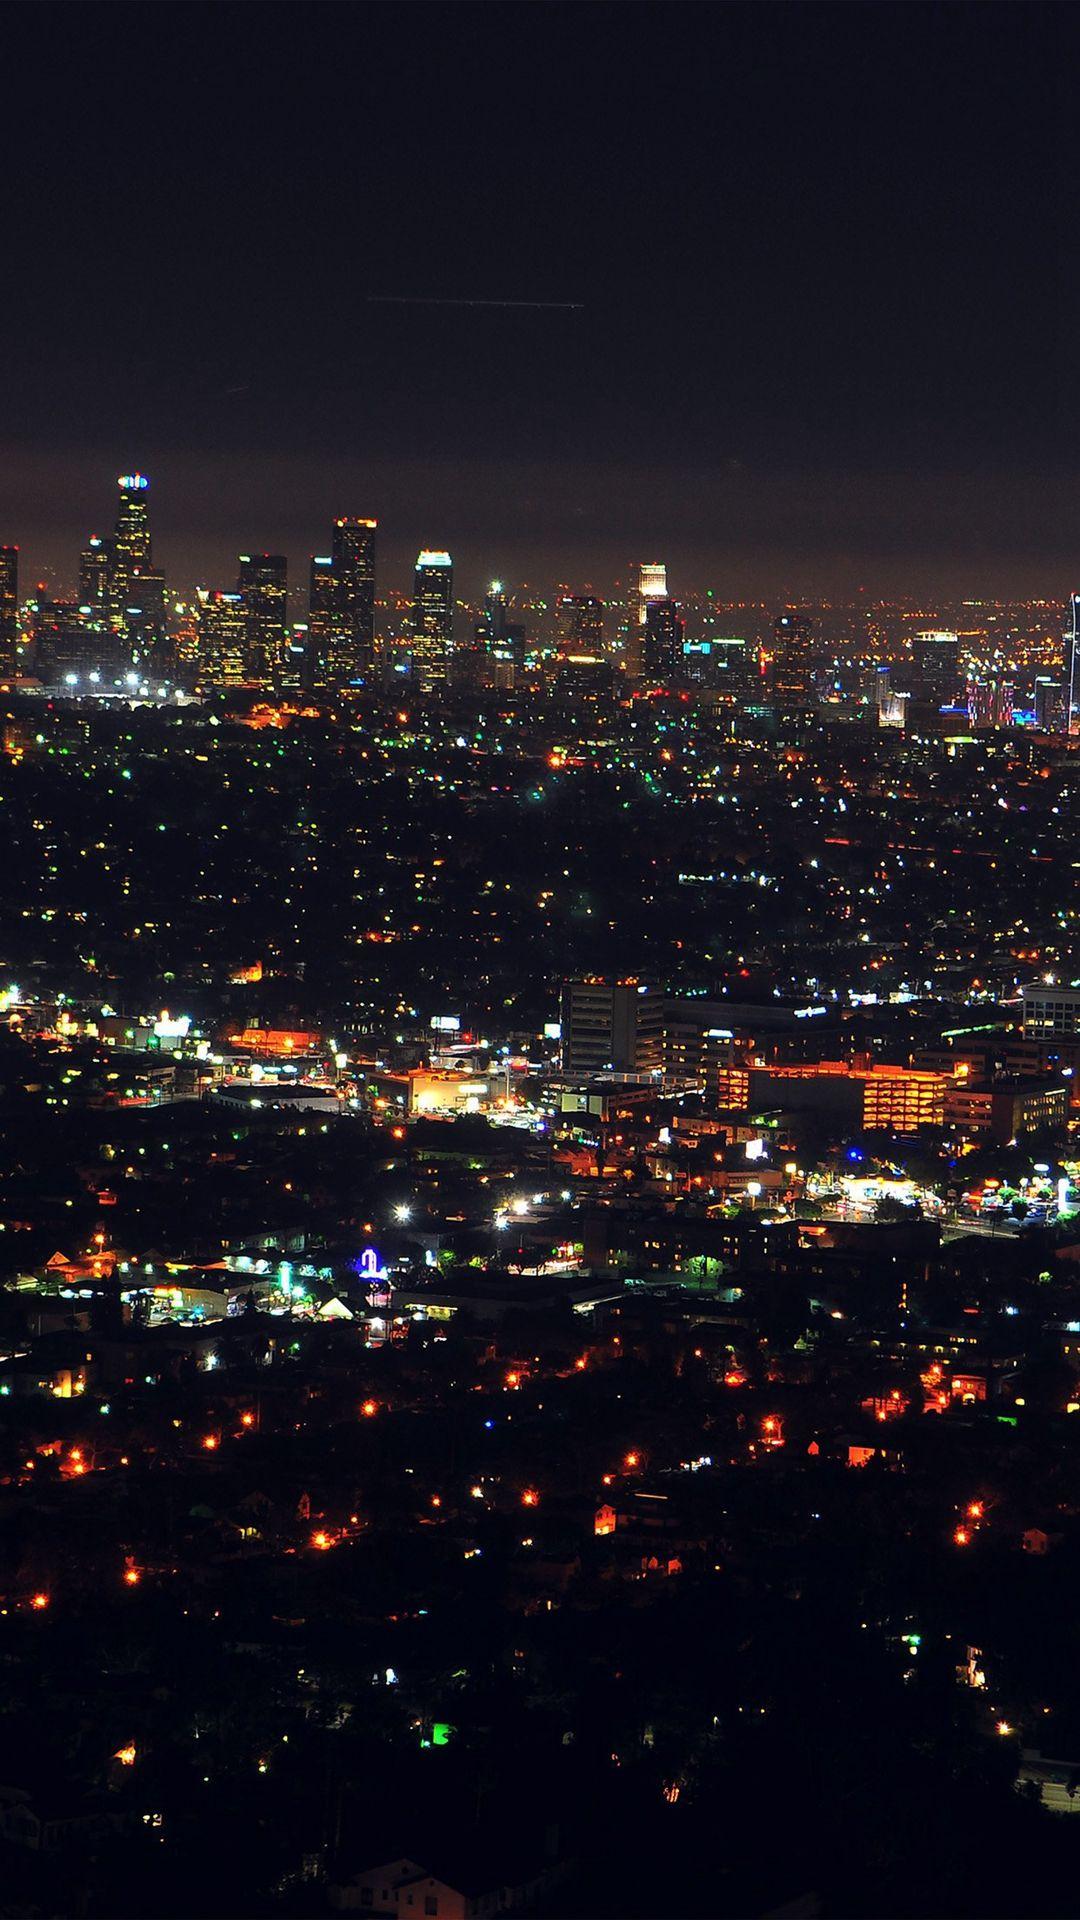 City View Night Light IPhone 6 Plus Wallpaper